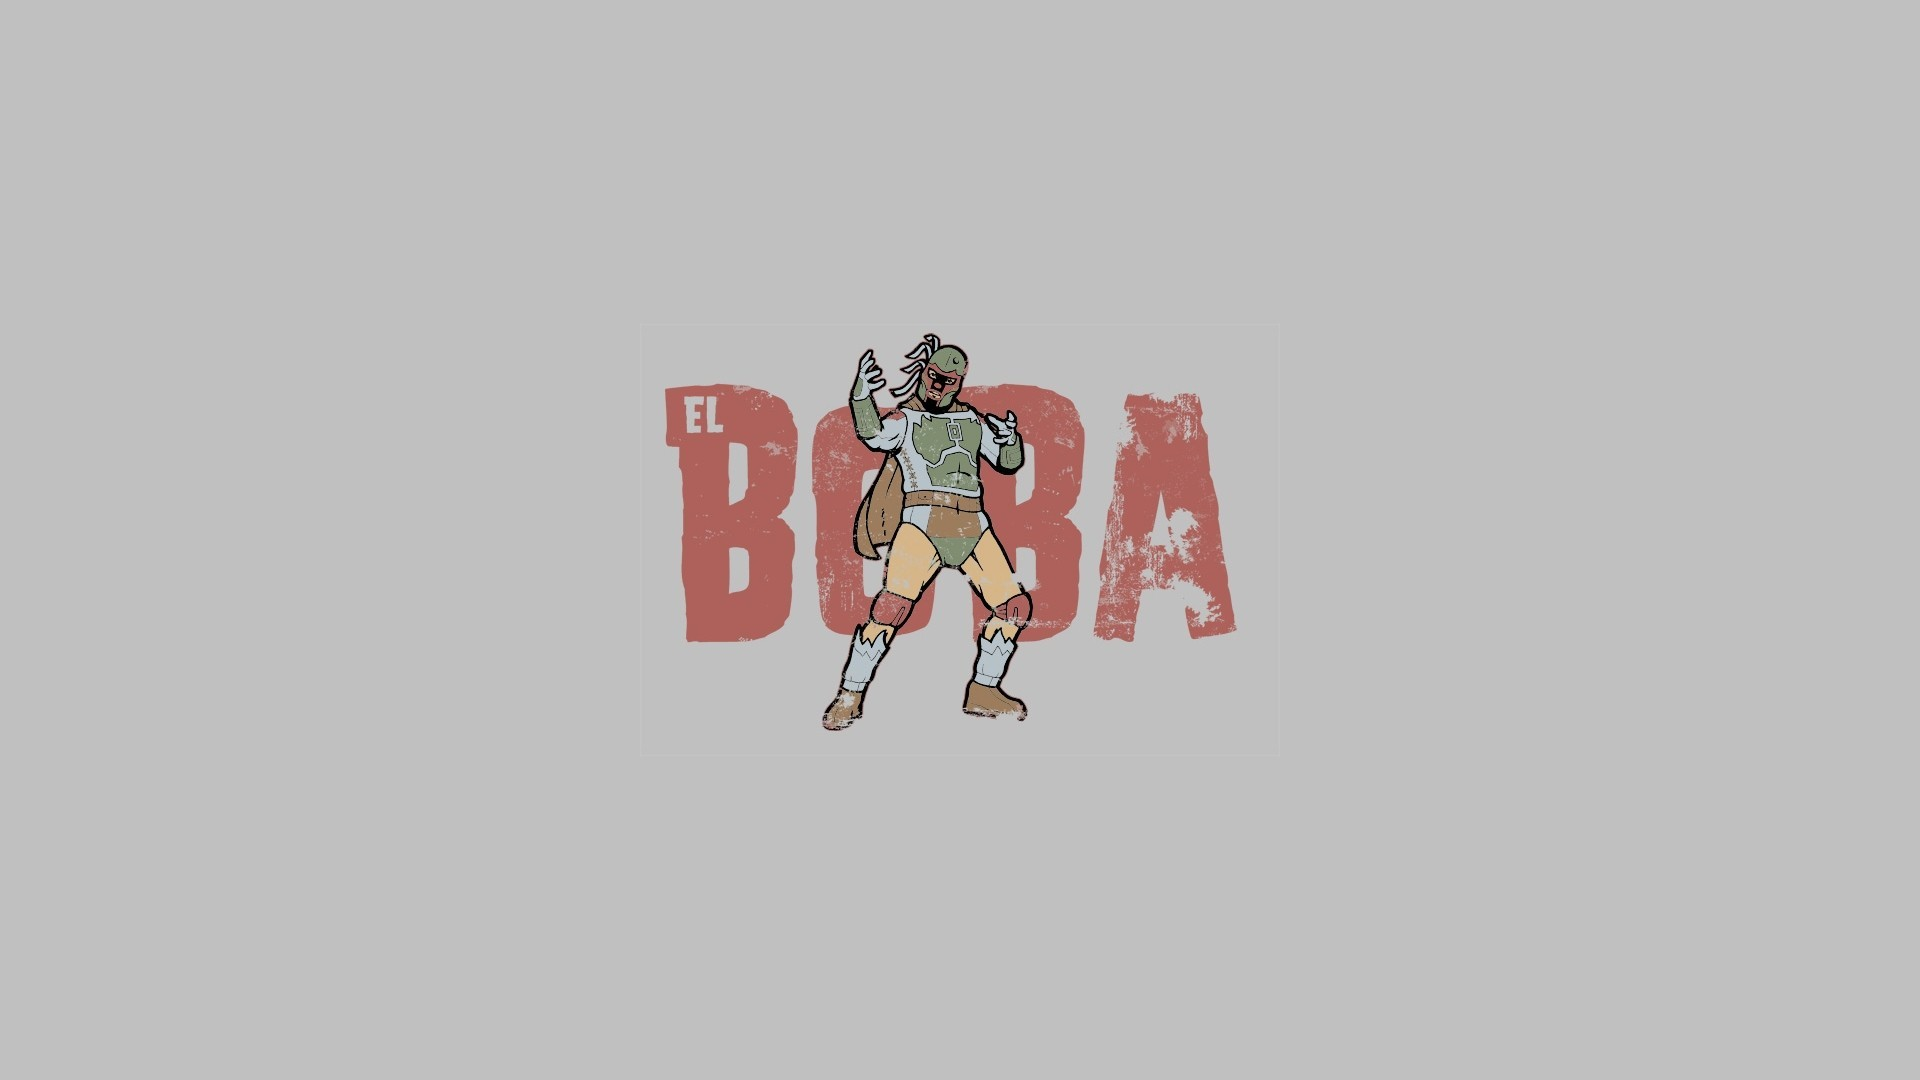 Cartoons abstract Star Wars Boba Fett solid simplistic simple wallpaper |  | 219728 | WallpaperUP